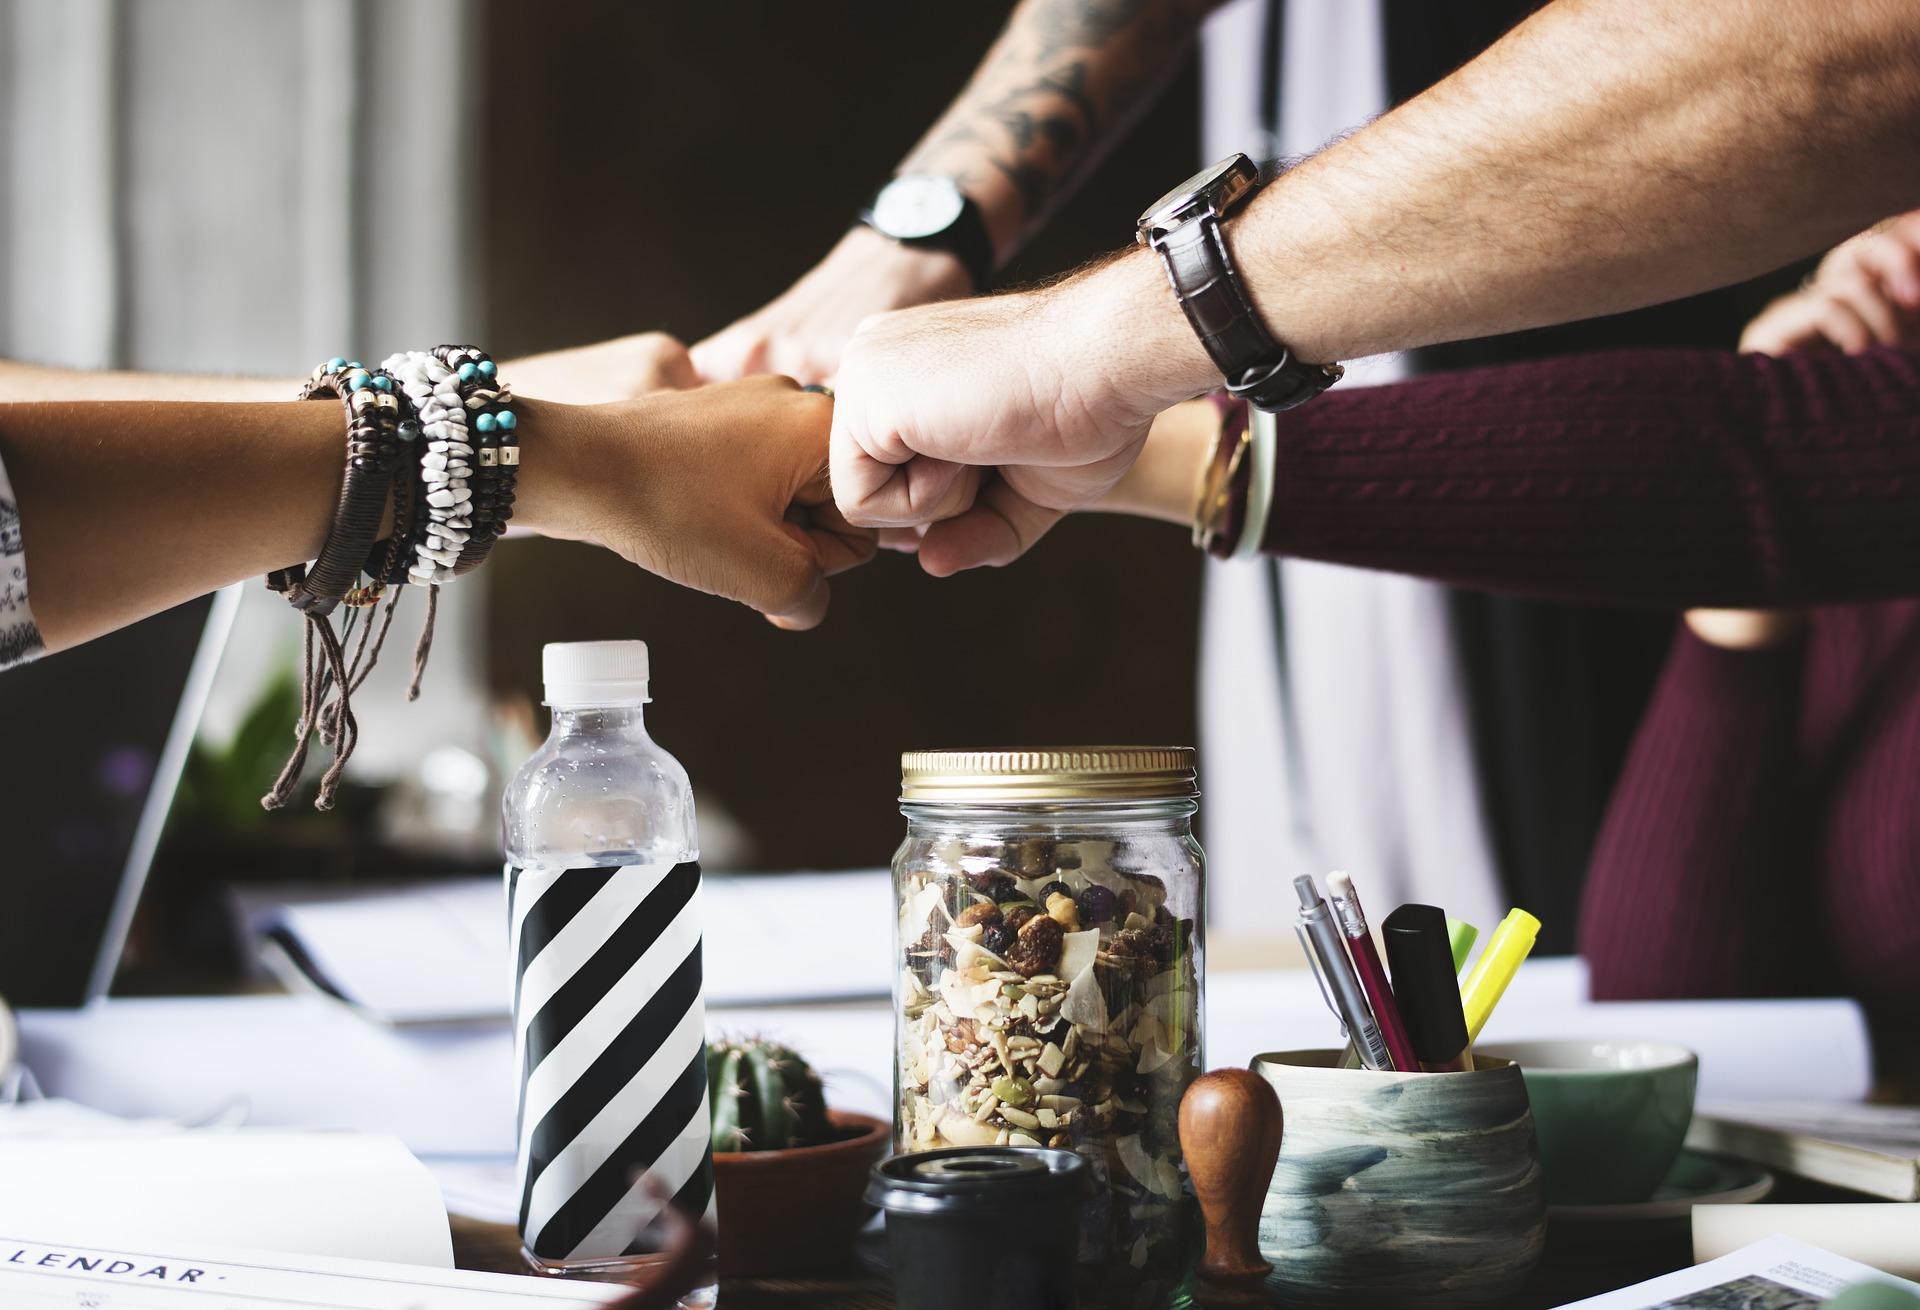 minneapolis-leadership-planning-business.jpg